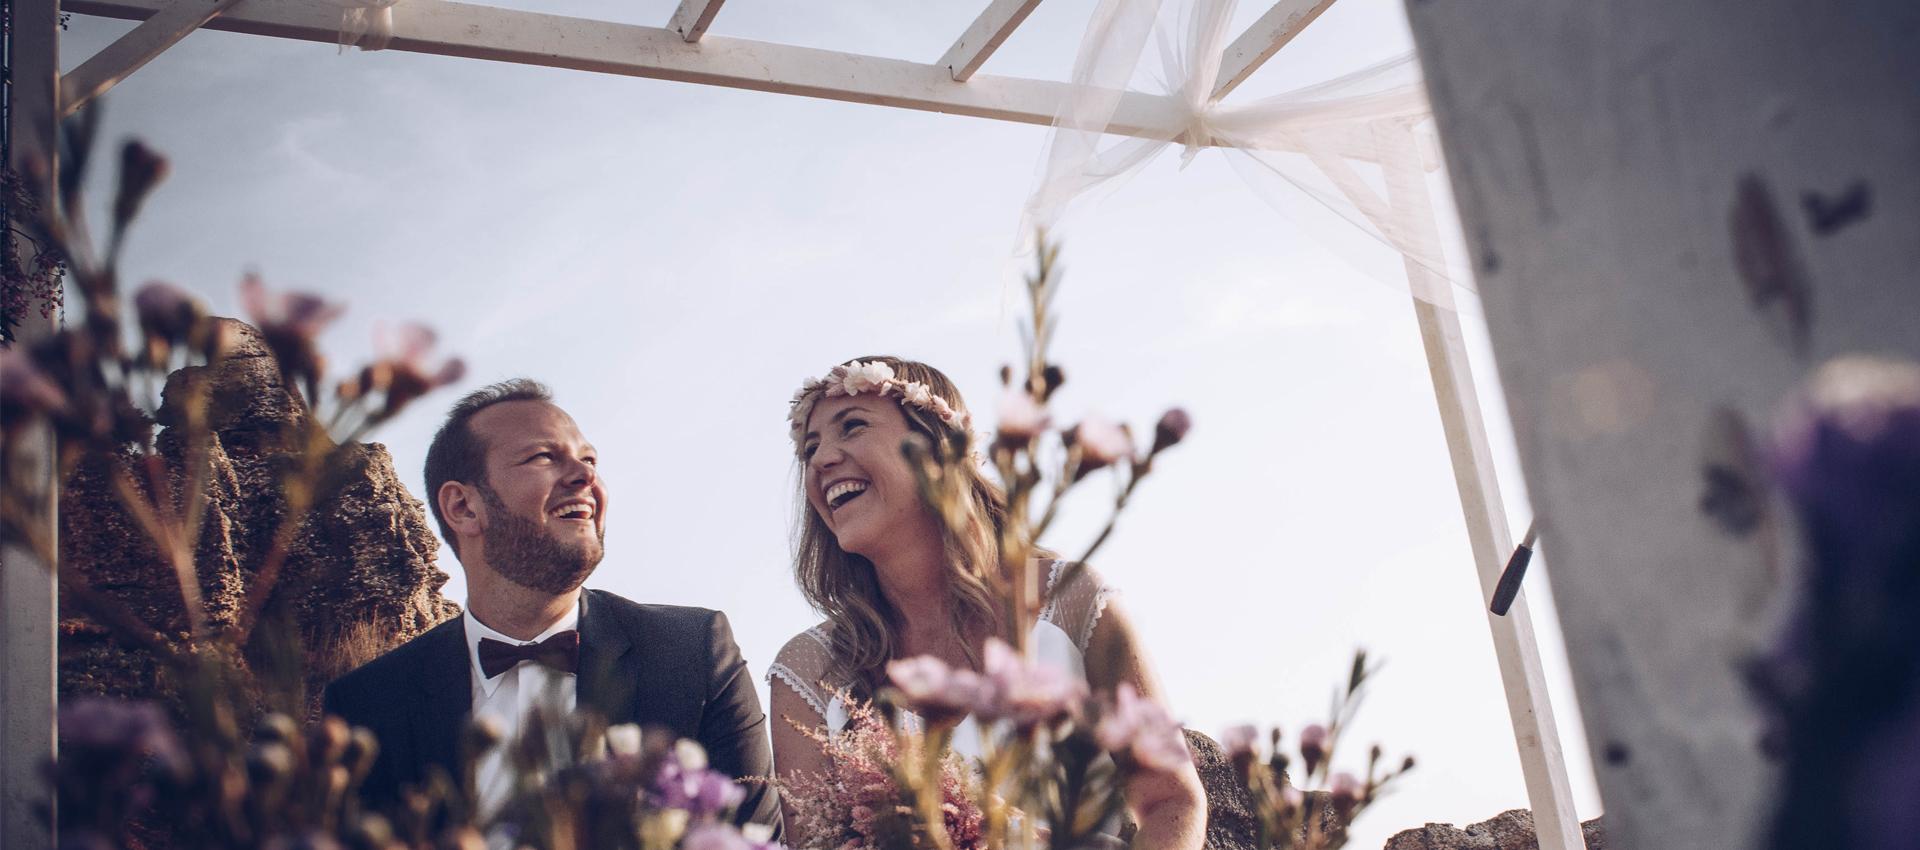 AlejandraJeremi Inicio - video boda cadiz